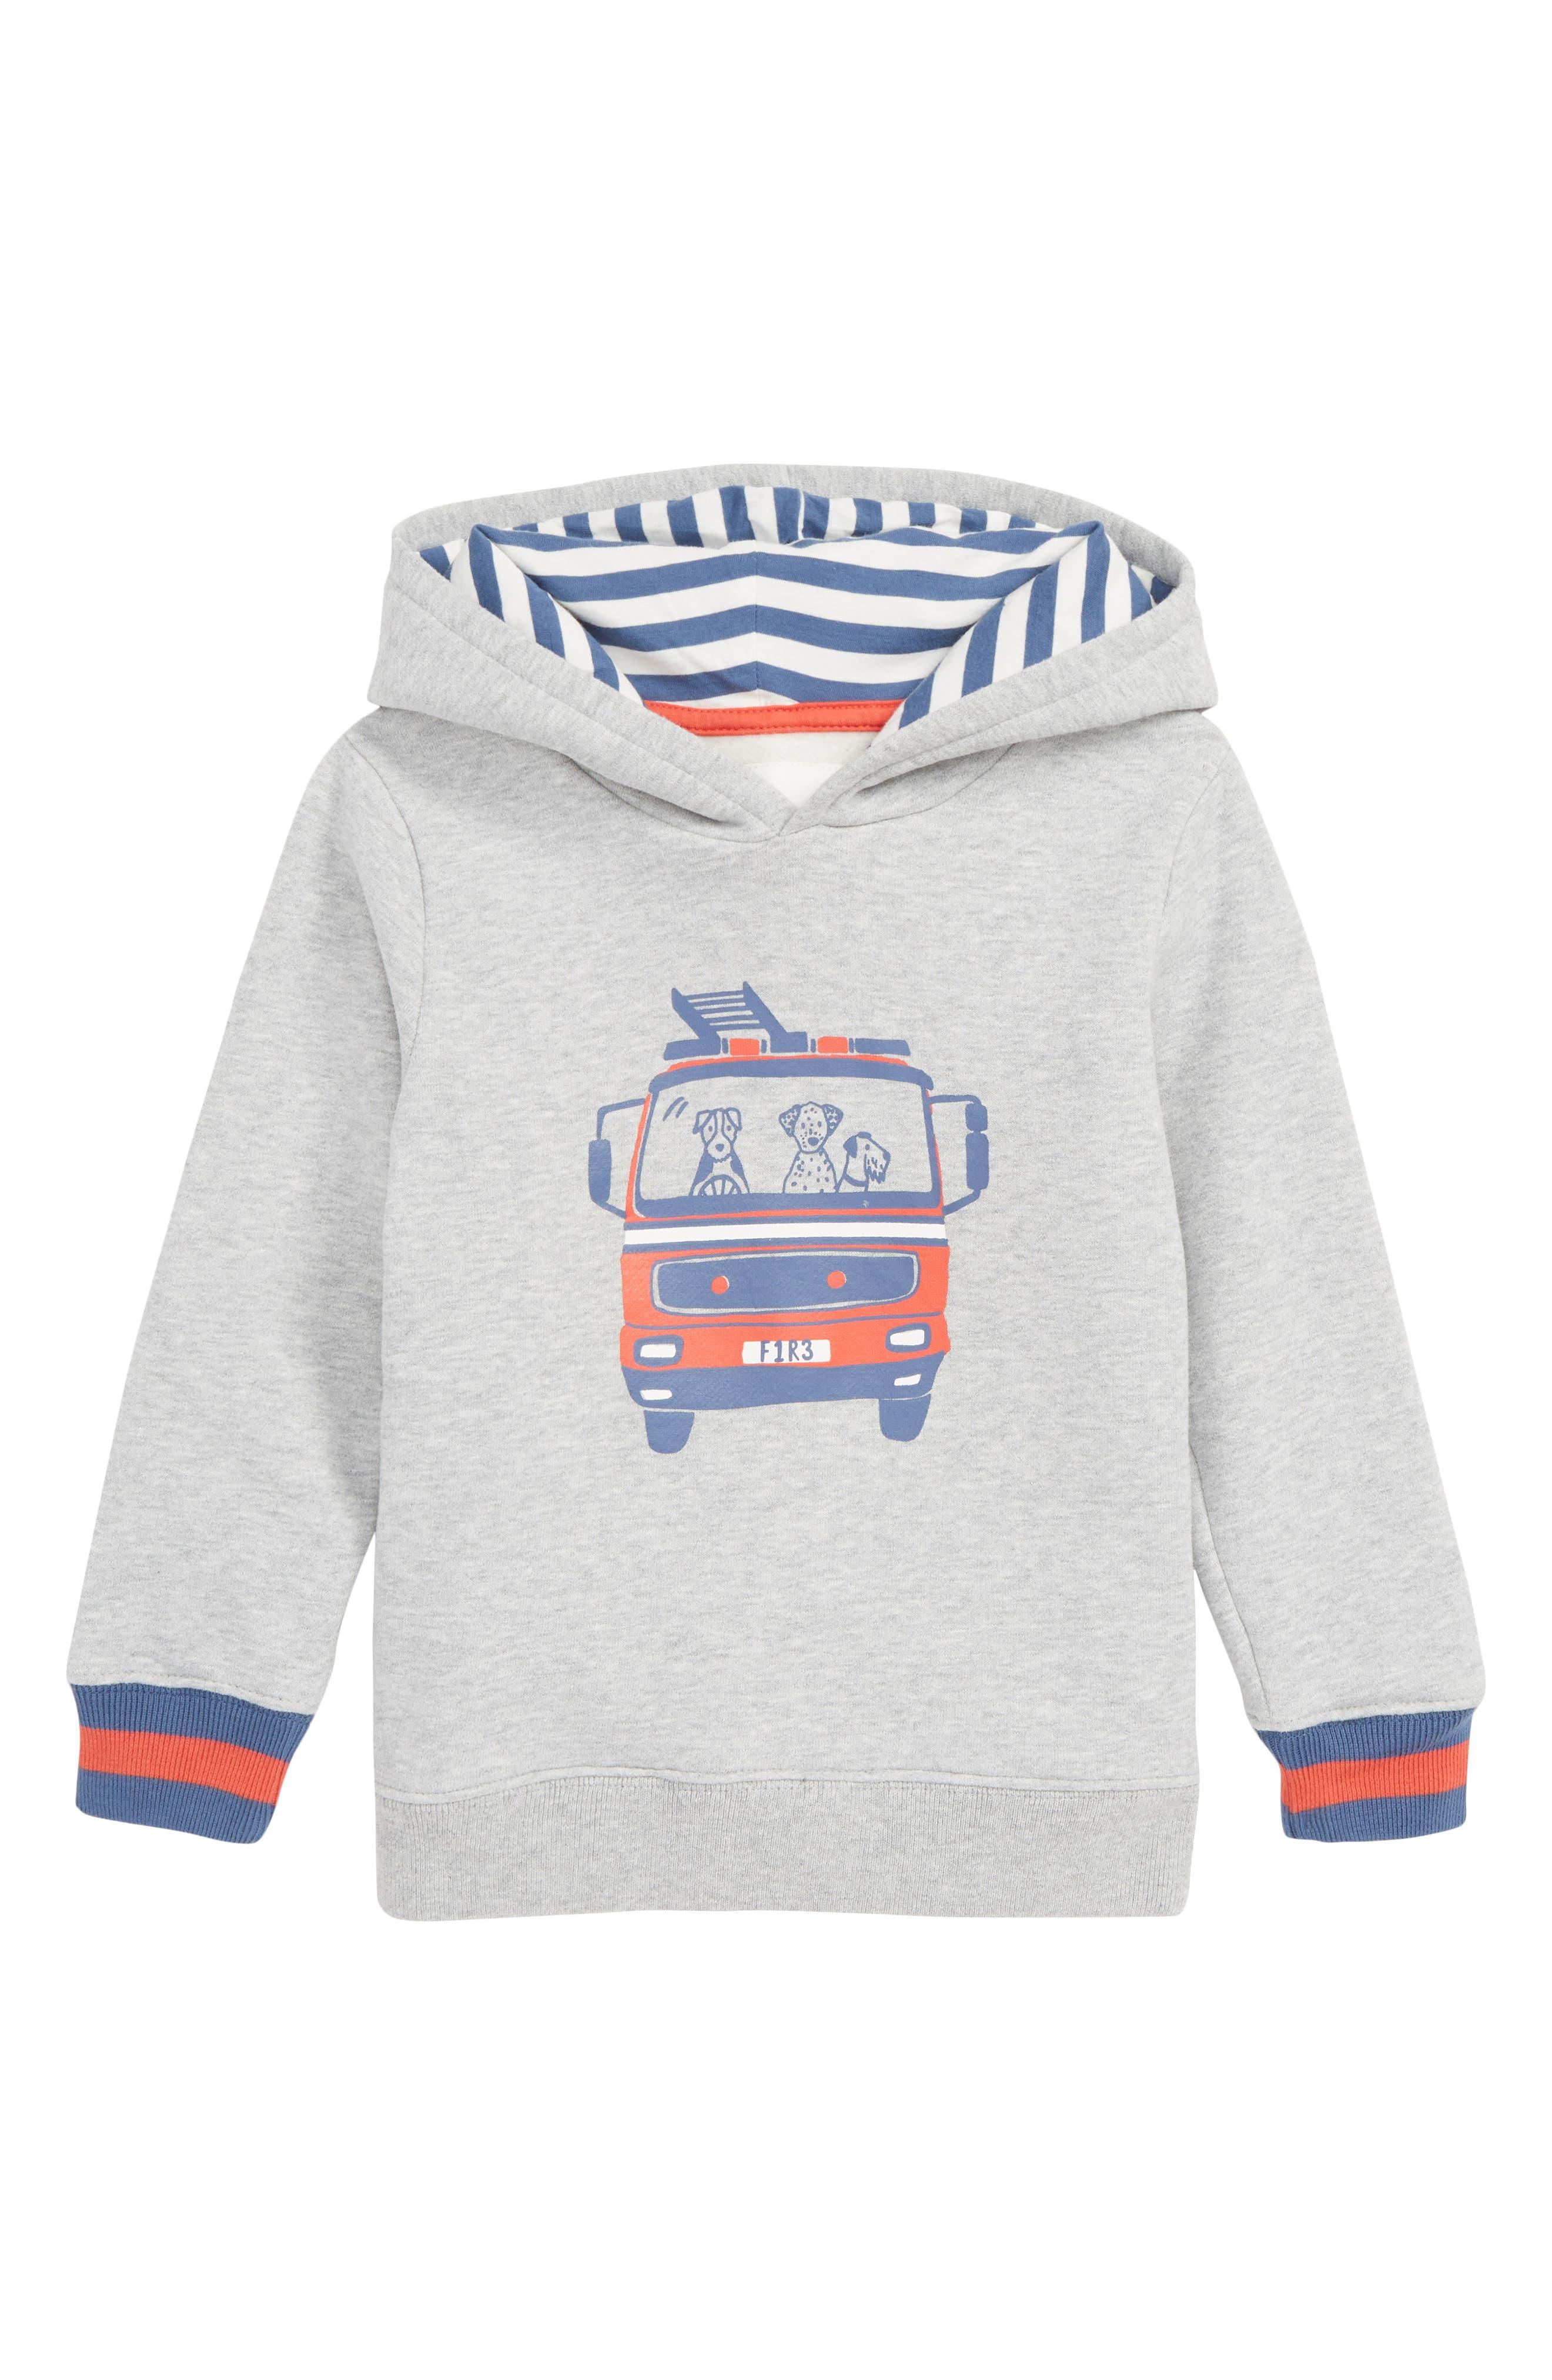 Boys Mini Boden Fire Engine Hoodie Size 1112Y  Grey